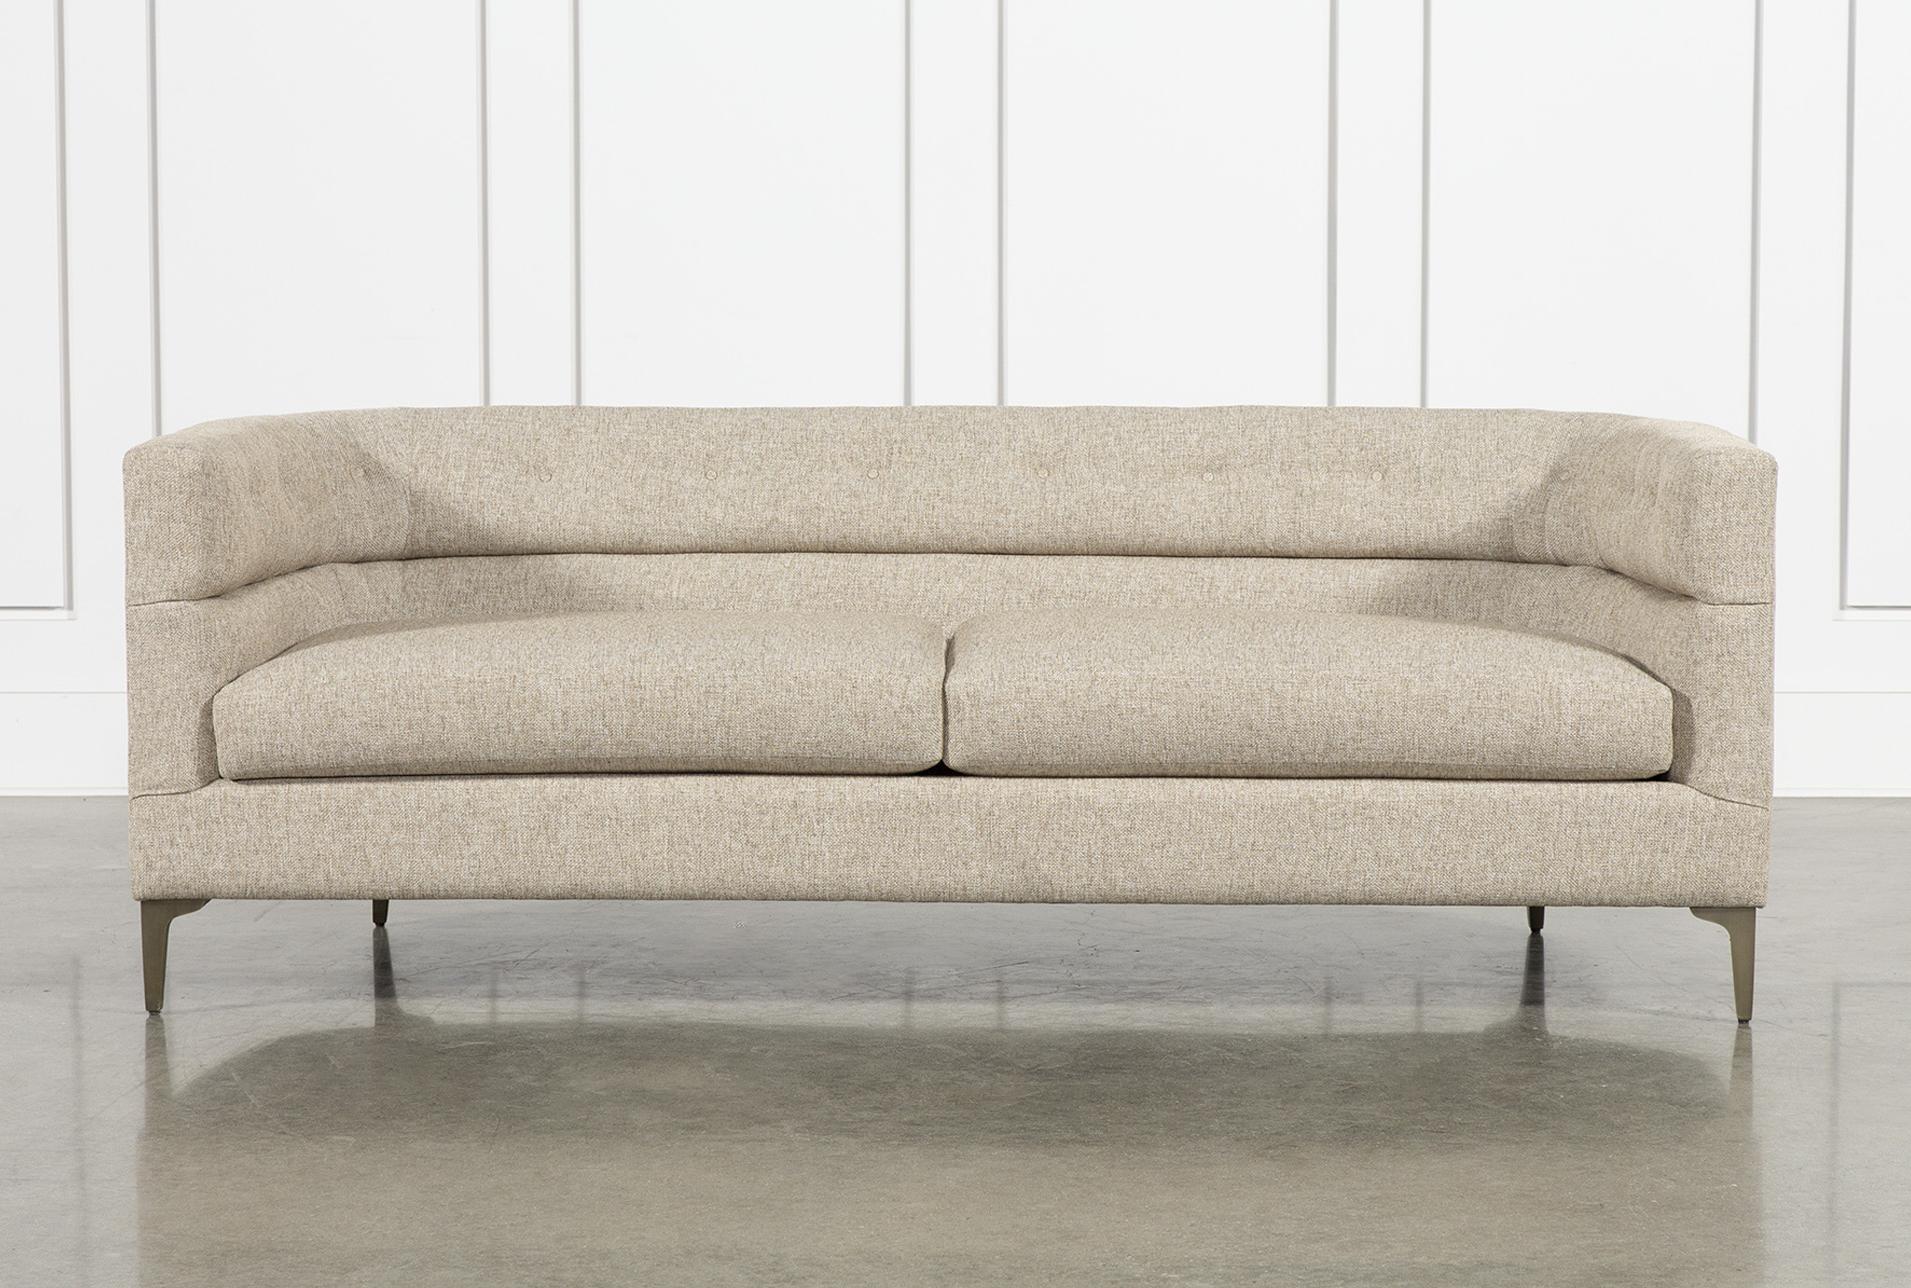 Matteo Arm Sofa Chairs By Nate Berkus And Jeremiah Brent